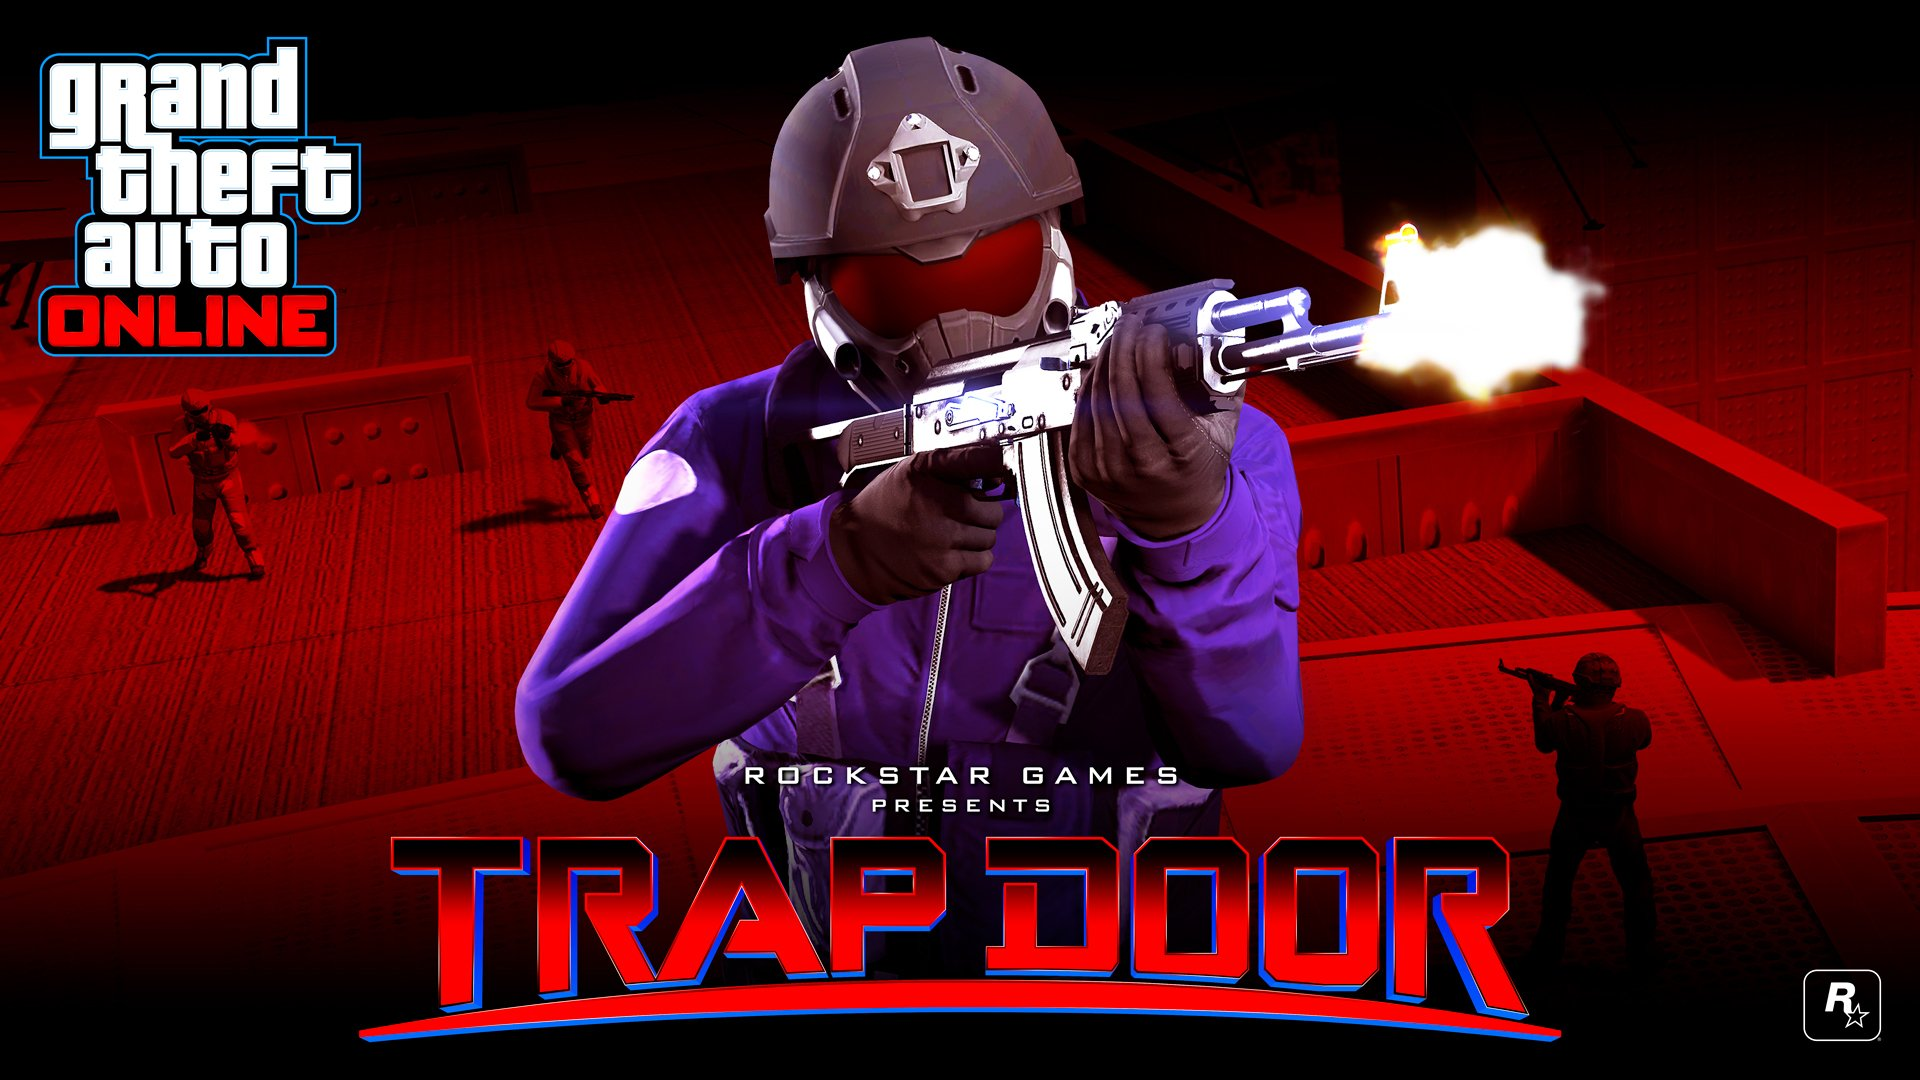 Rockstar  sc 1 st  AllGamers & Grand Theft Auto 5 adds battle royale mode Trap Door | AllGamers